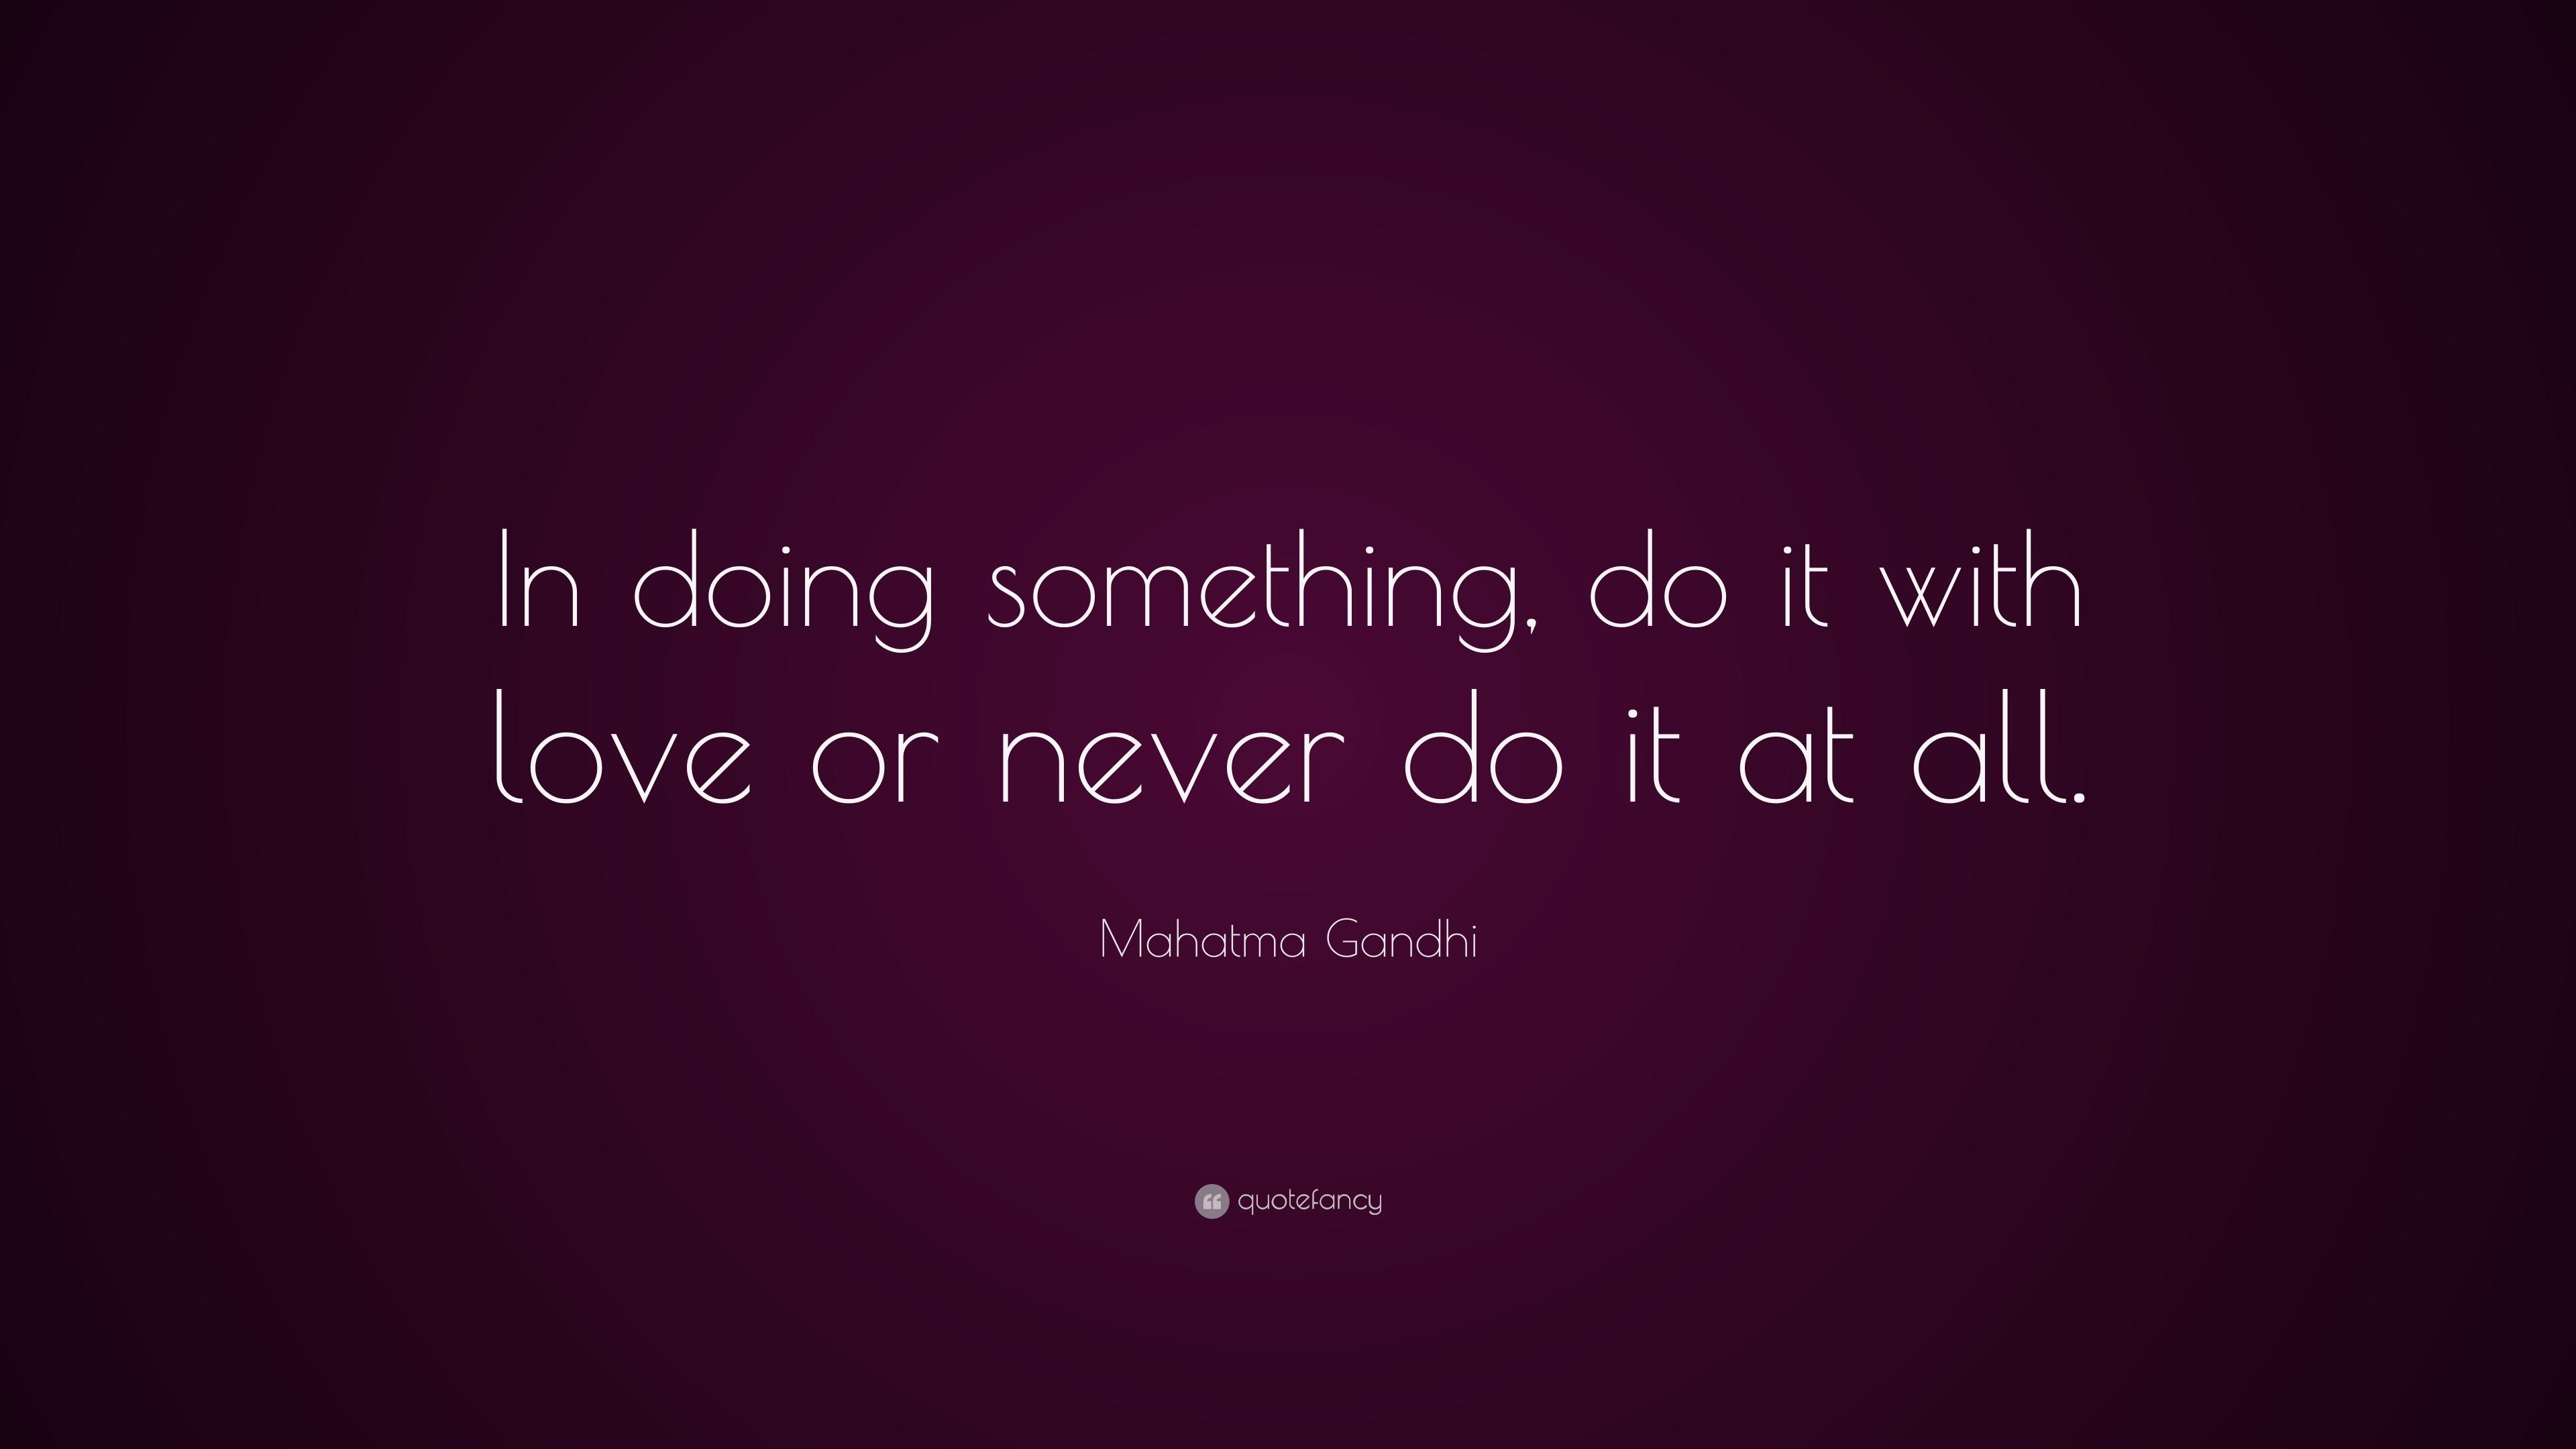 gandhi quotes wallpaper - photo #22